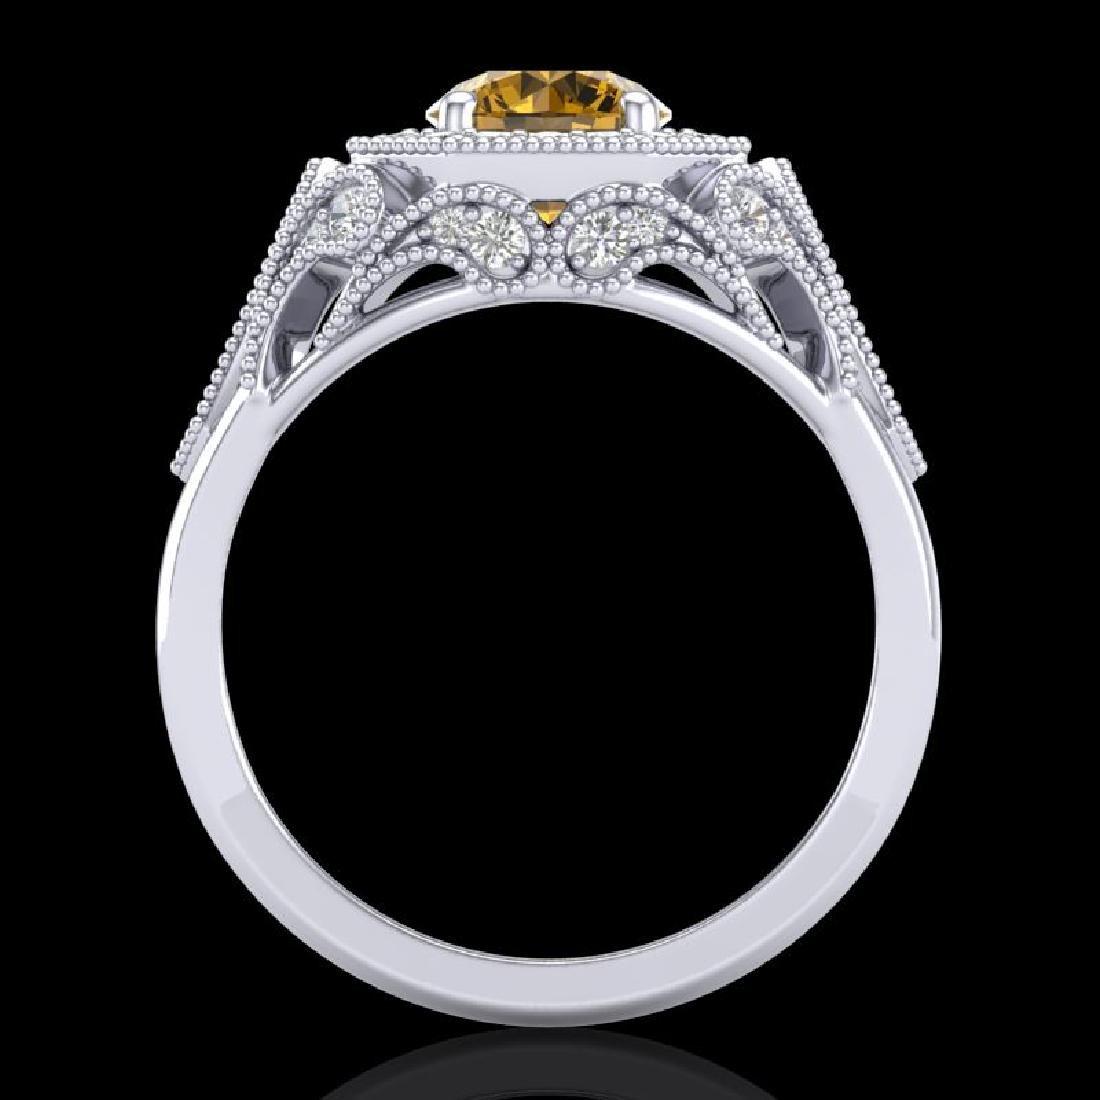 1.75 CTW Intense Fancy Yellow Diamond Engagement Art - 3